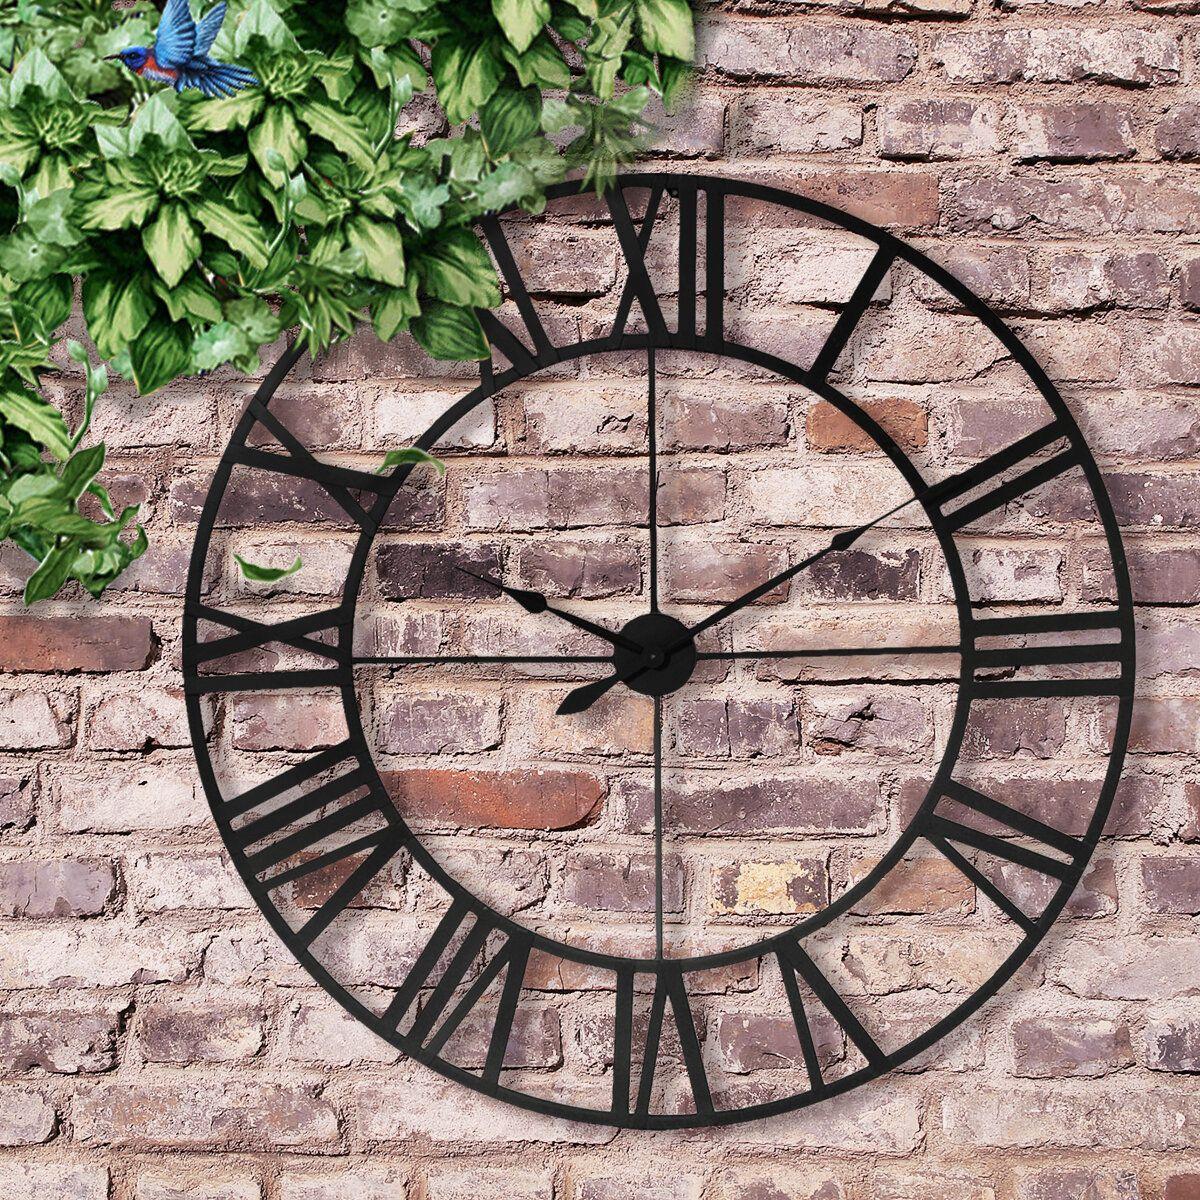 80cm Large Outdoor Garden Wall Clock Roman Numerals Giant Open Face Metal